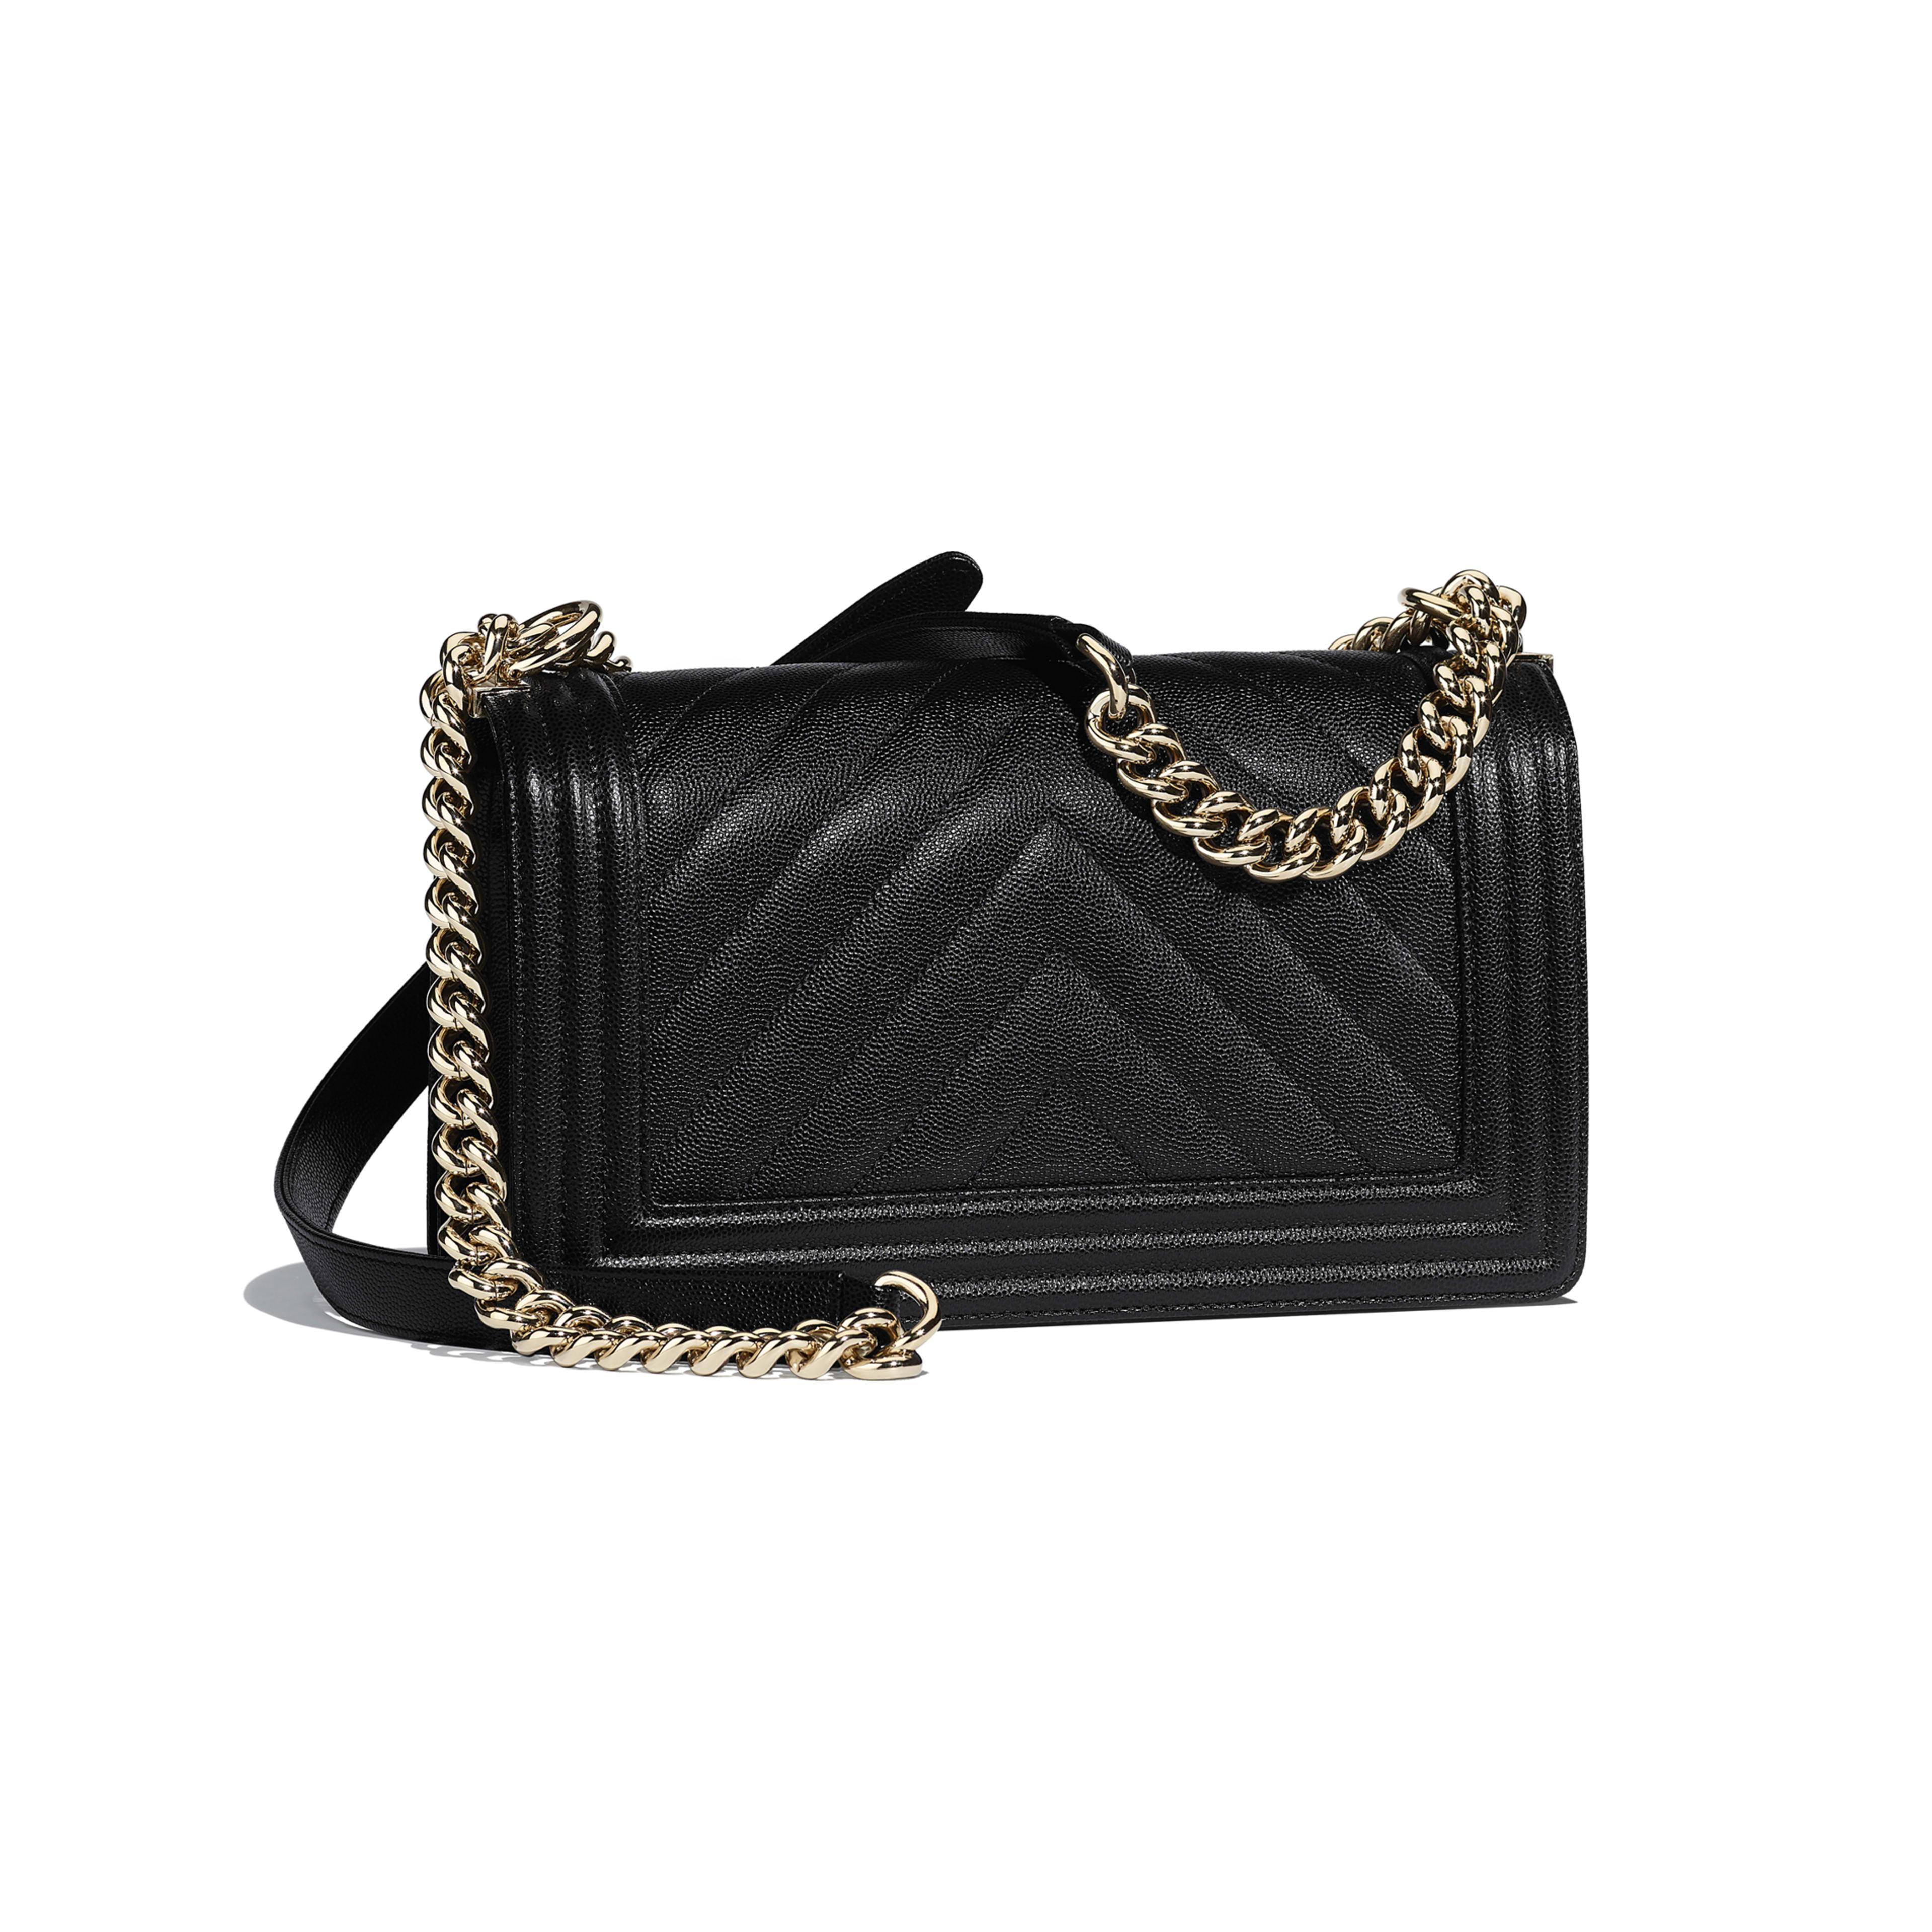 f3ca640166ed94 Boy Chanel Handbag Calfskin & Gold-tone Metal | Stanford Center for ...